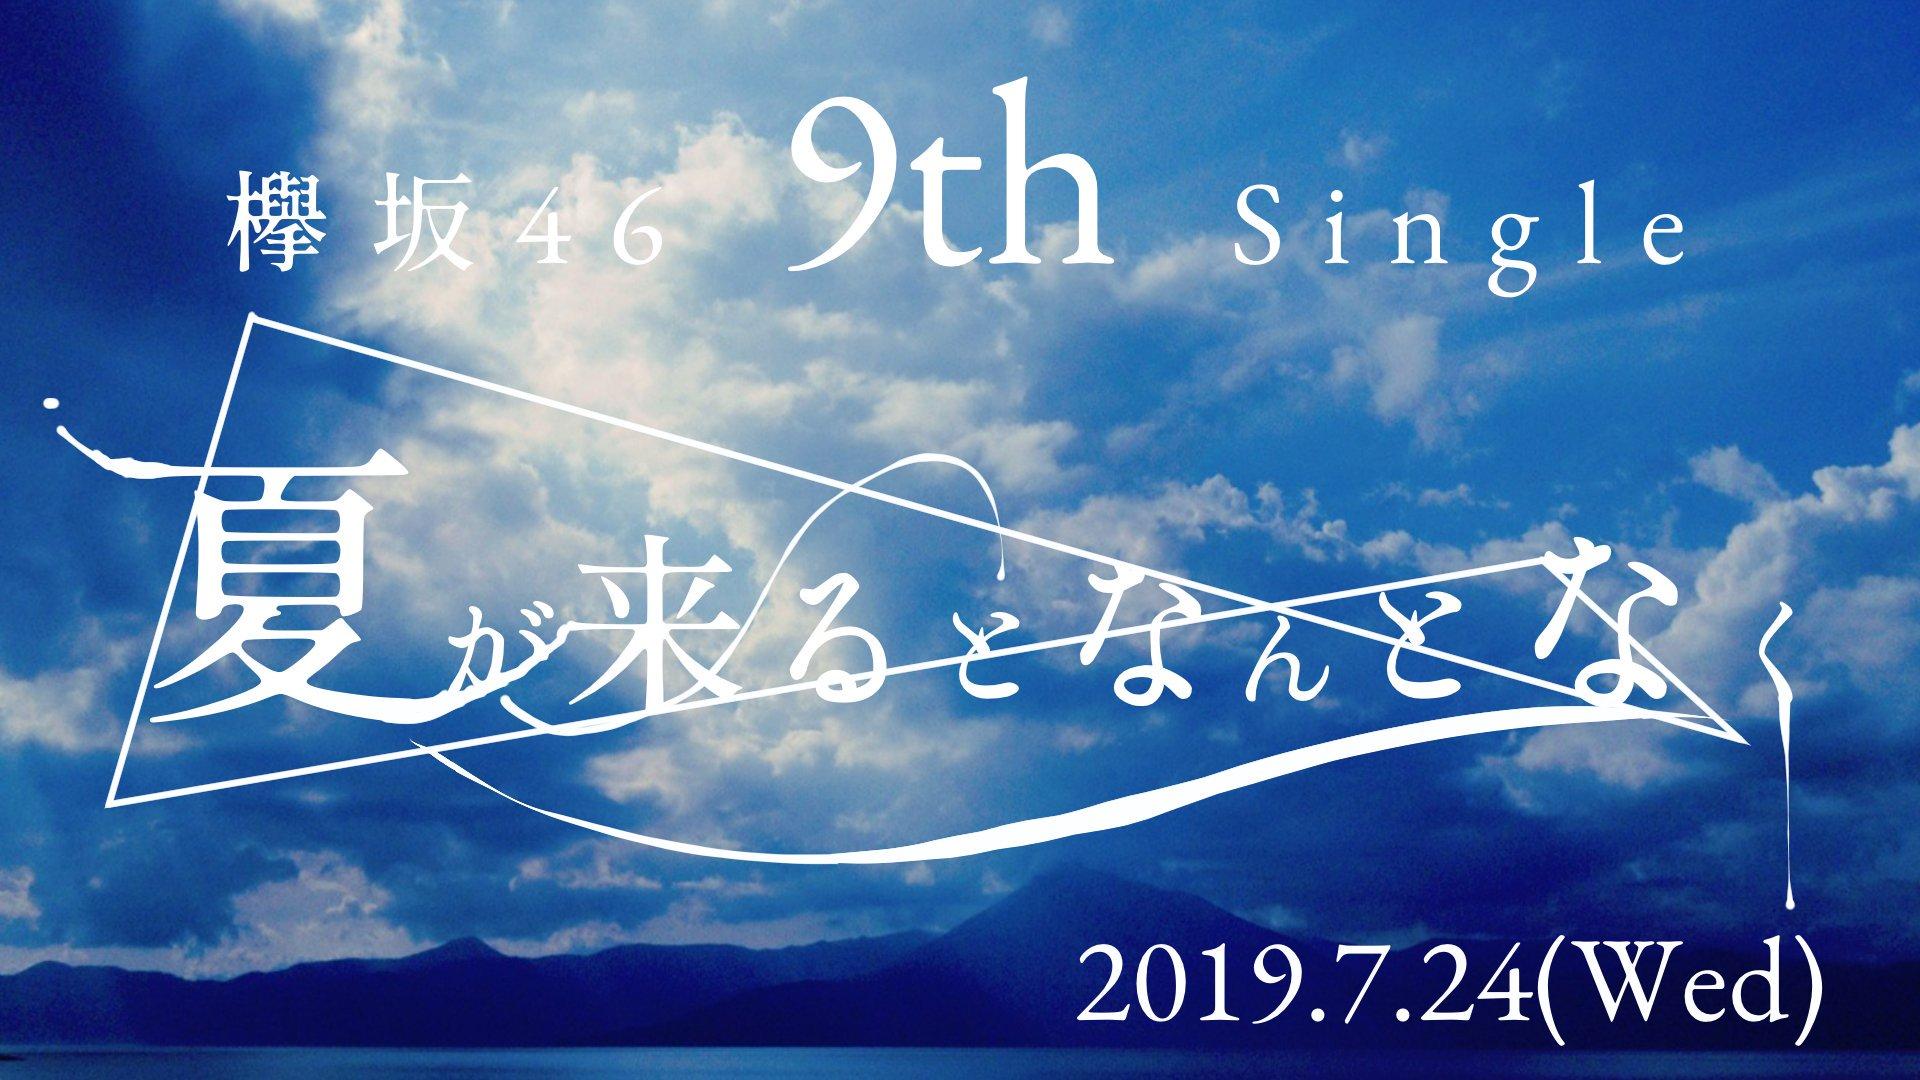 9th 46 欅 坂